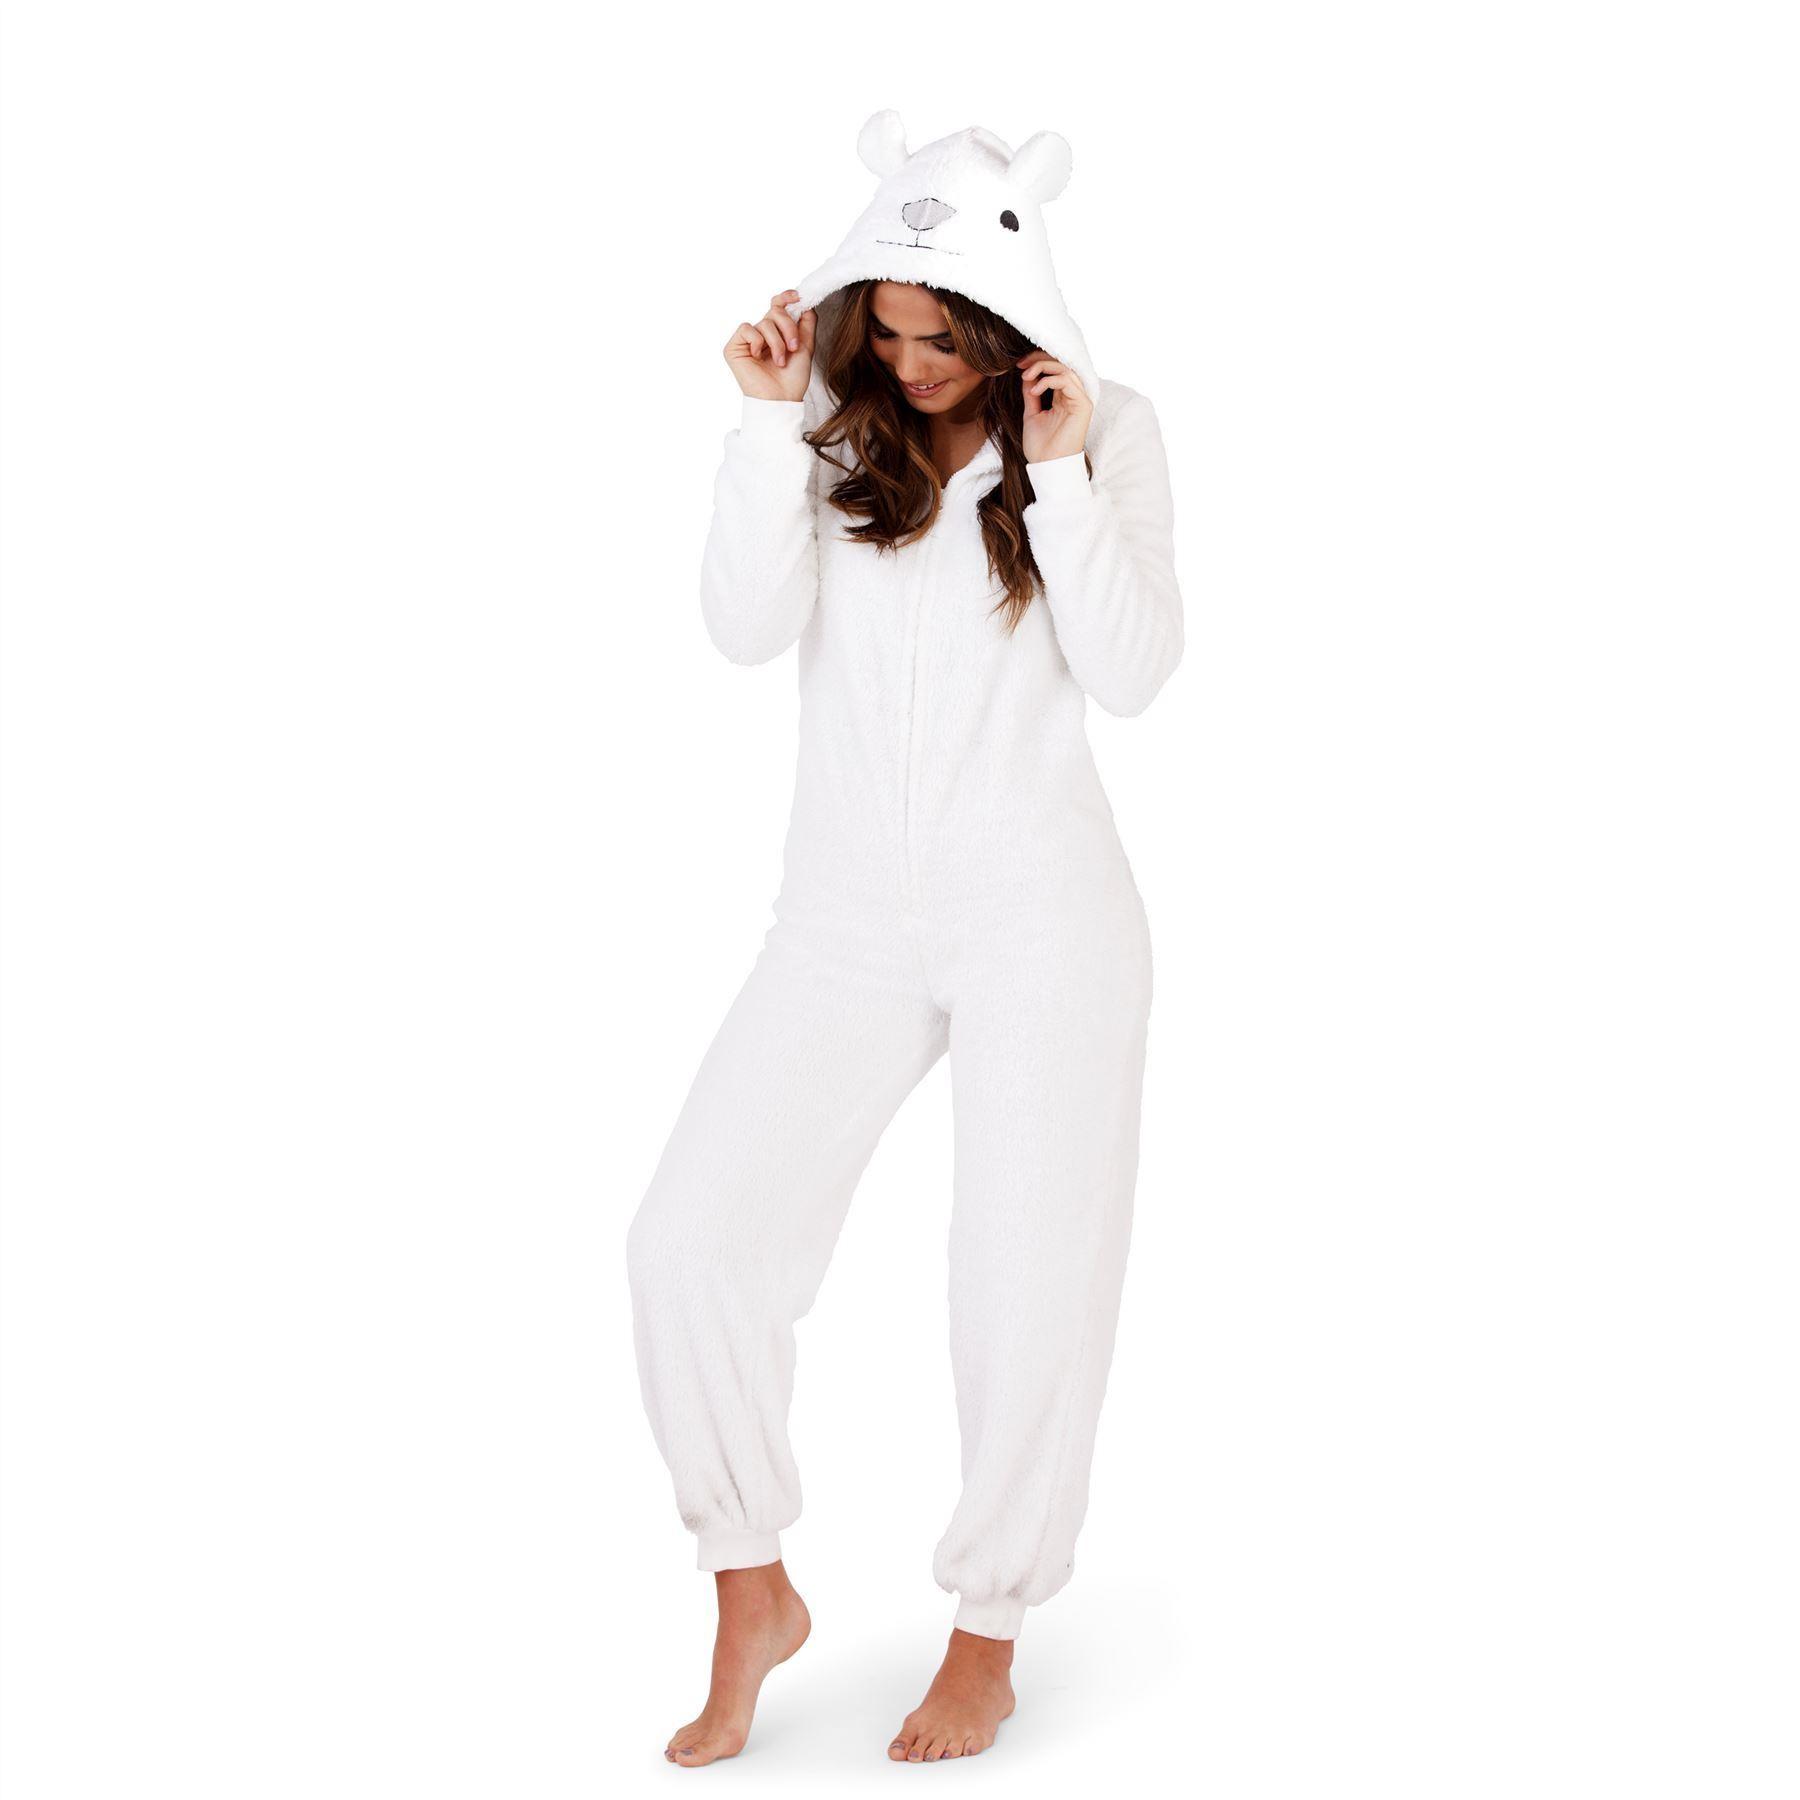 Loungeable Boutique Polar Bear Onesie - White